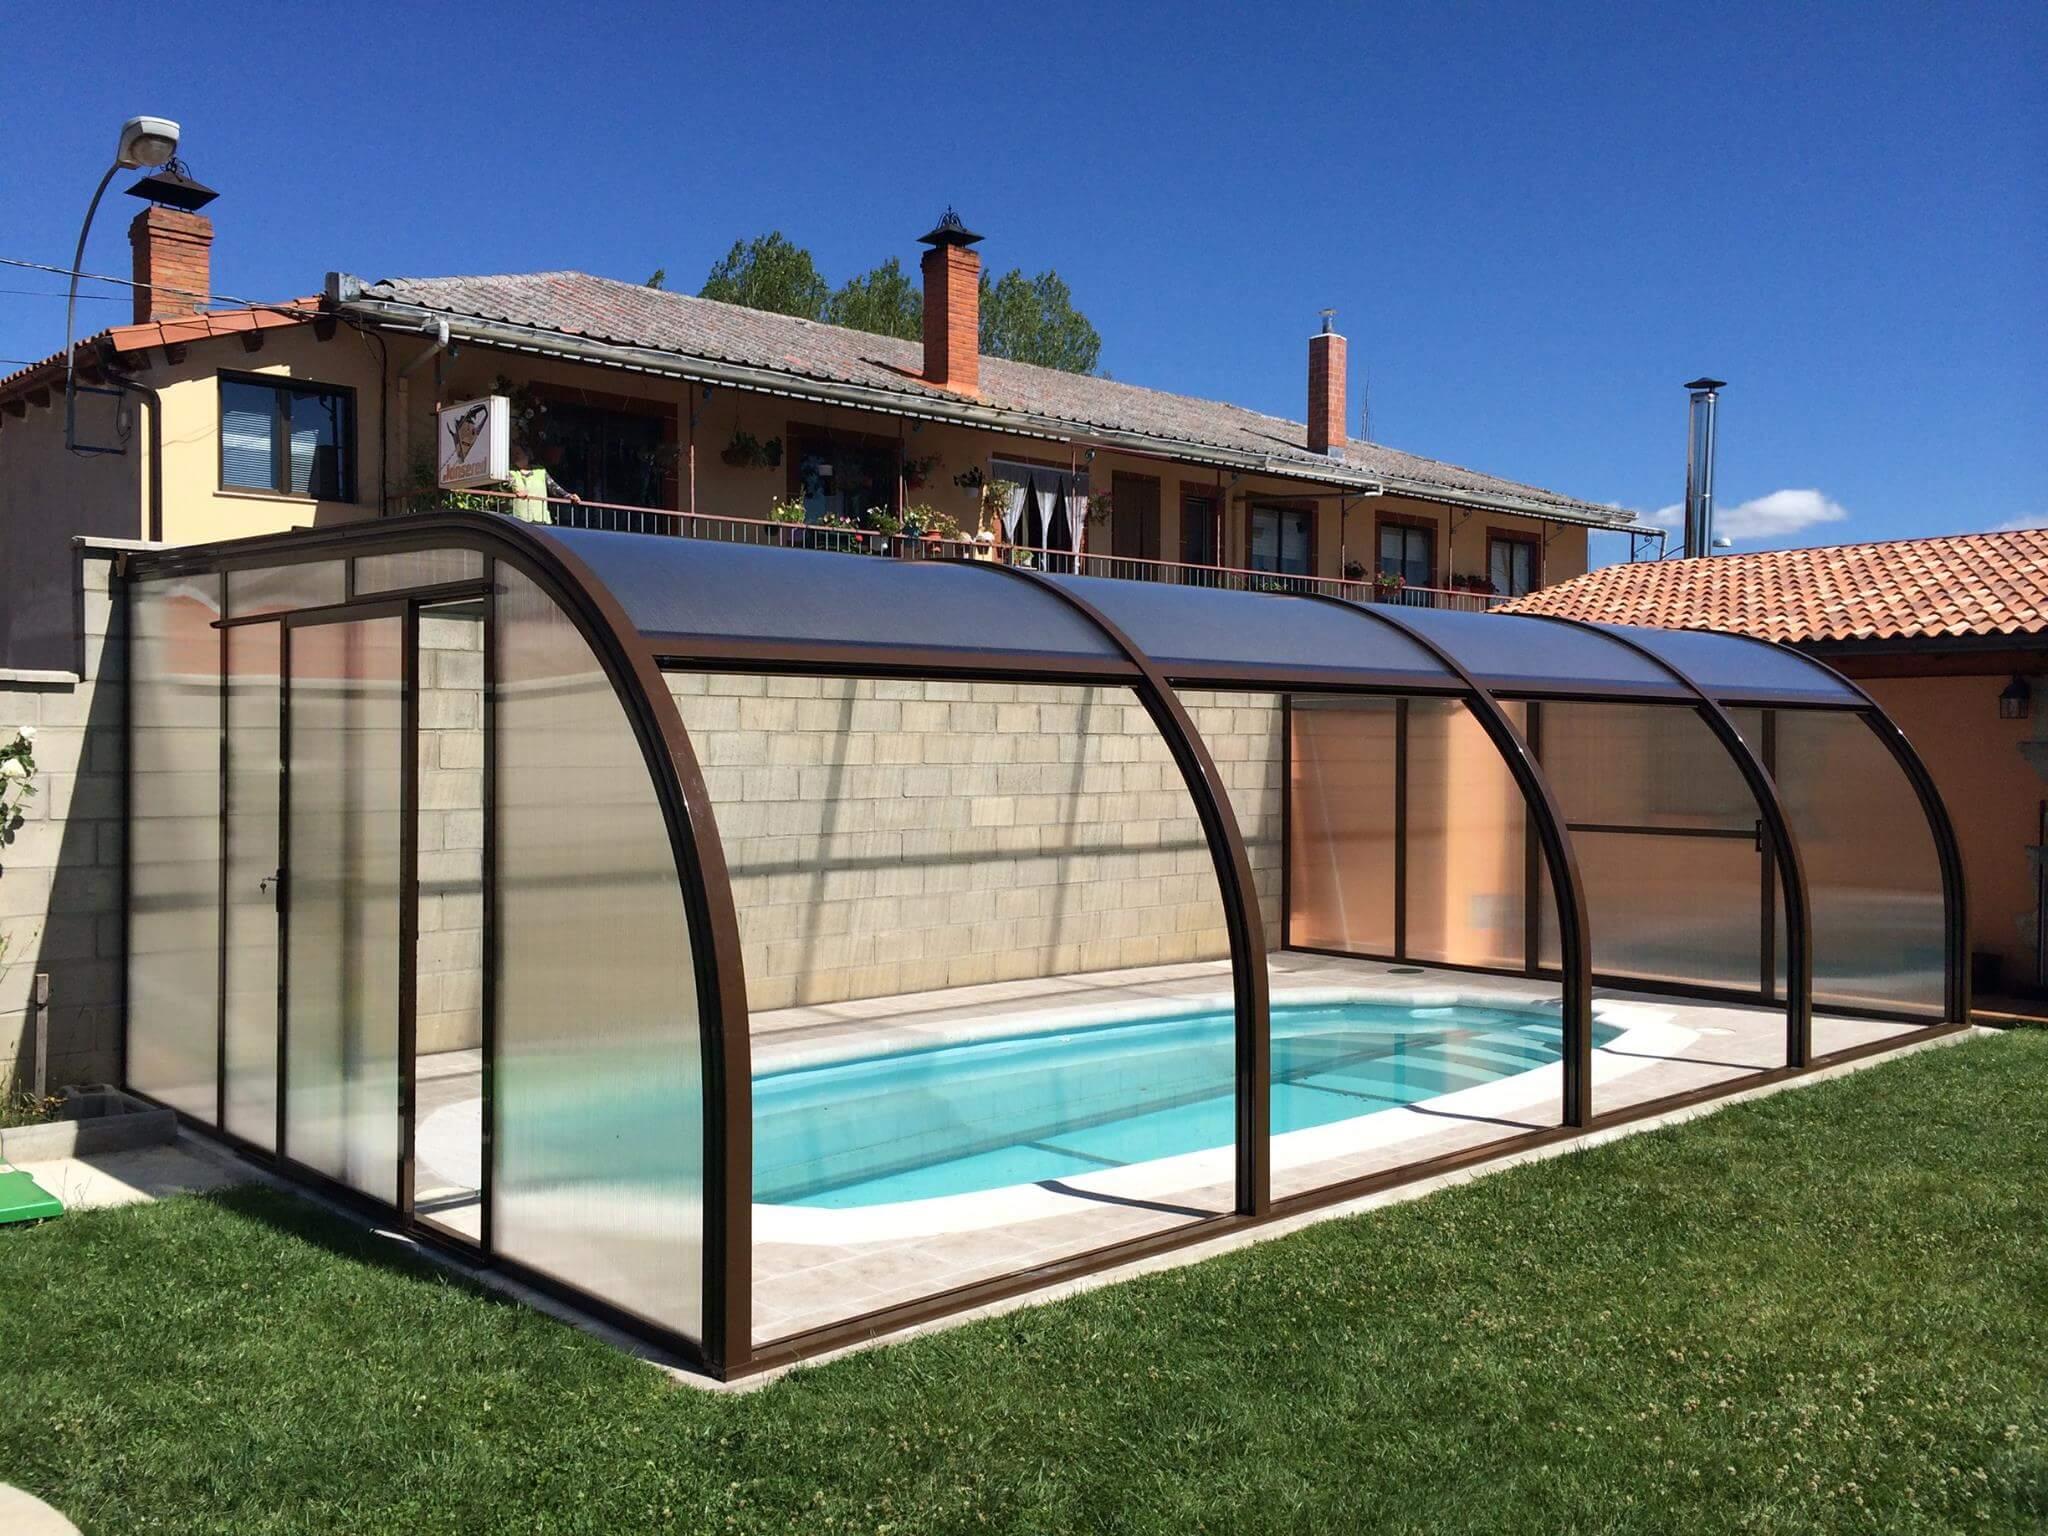 Cuanto cuesta cubrir una piscina best piscina cubierta - Cuanto cuesta una piscina de obra ...